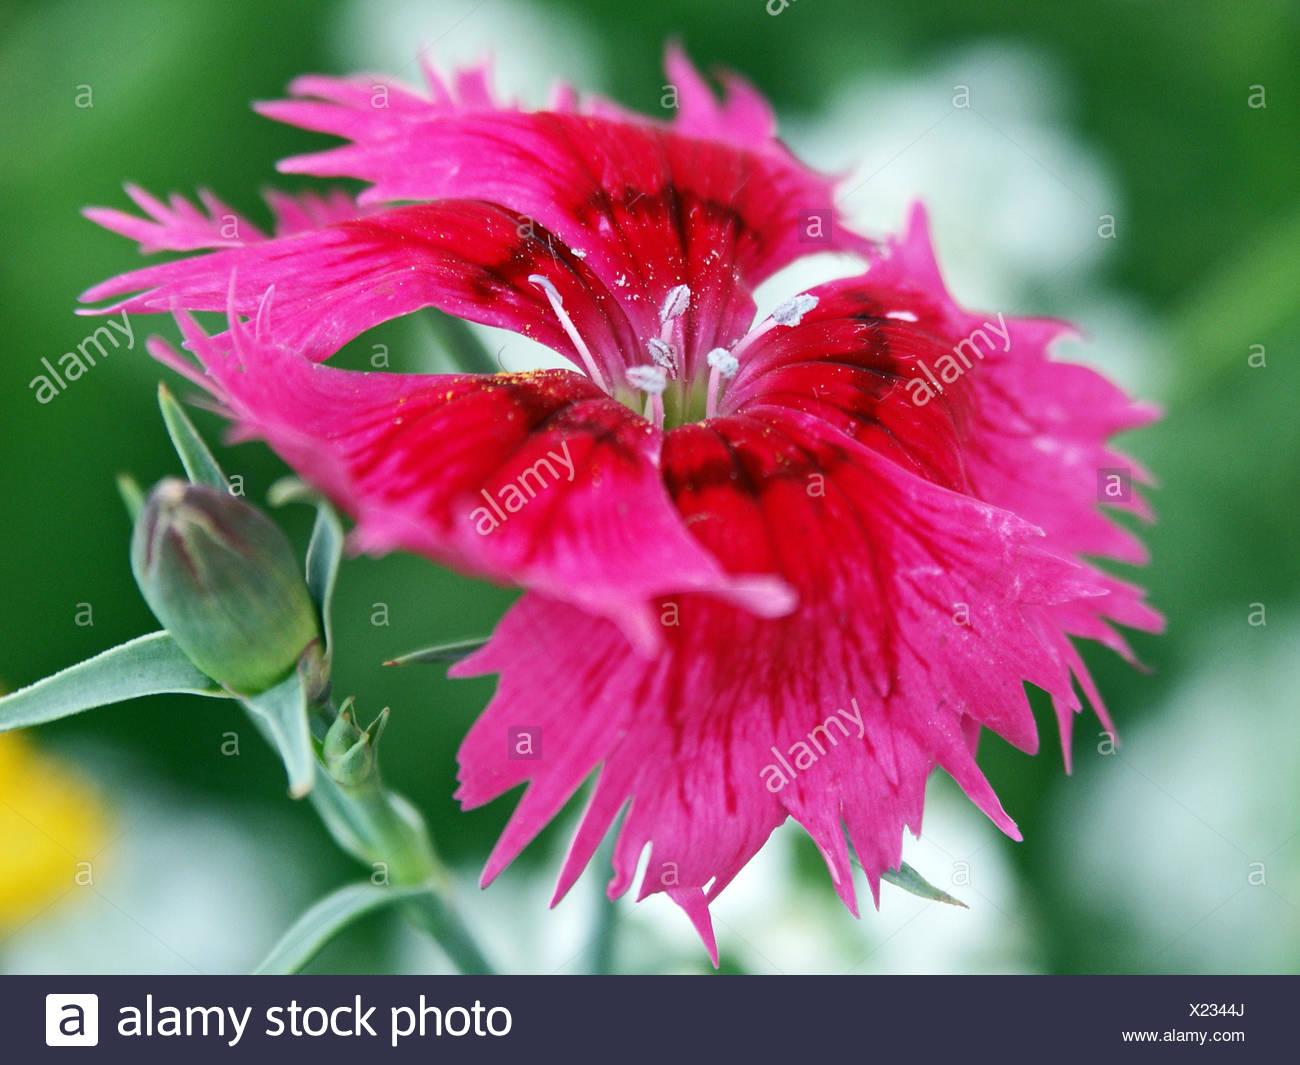 carnation flower plant green carnation bloom blossom flourish flourishing - Stock Image